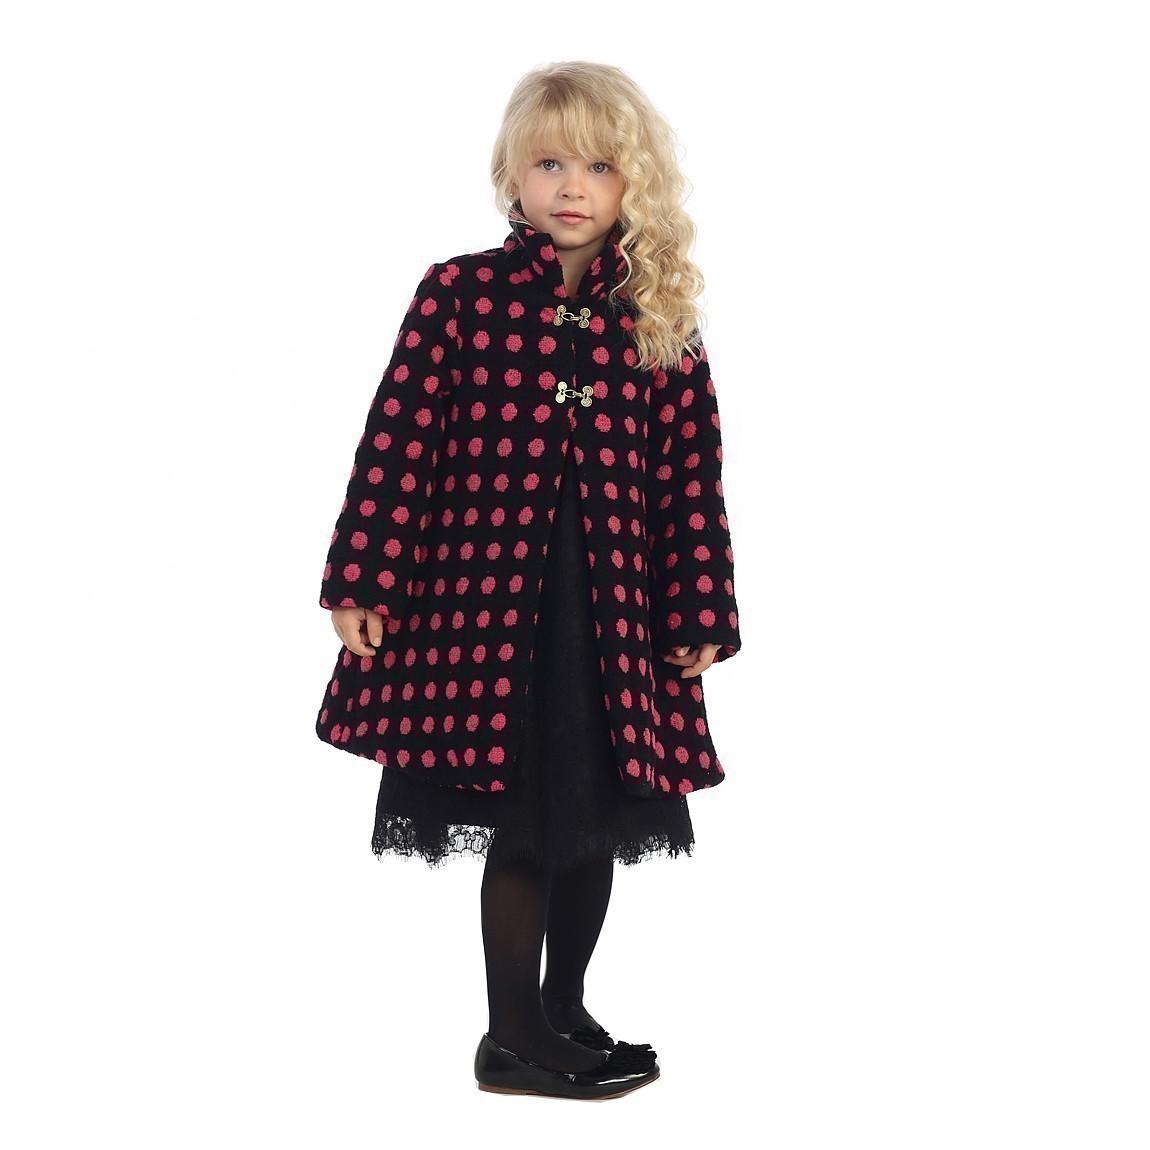 Angels Garment Girls Black Pink Polka Dotted Fall/Winter ...